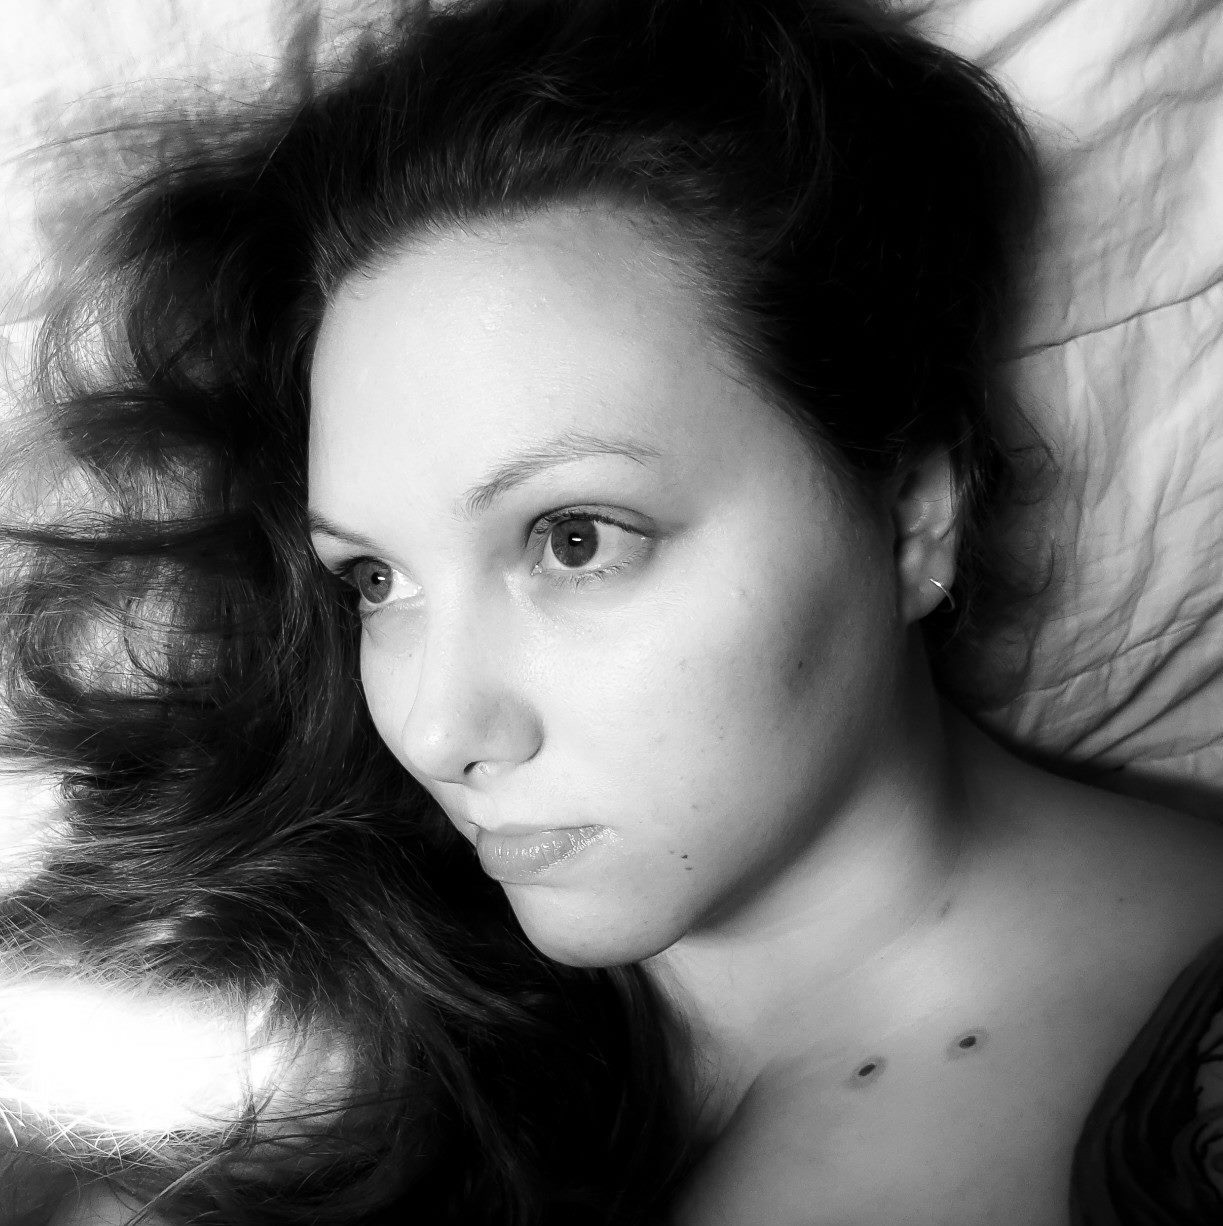 Kristy (Taominx) self-portrait.